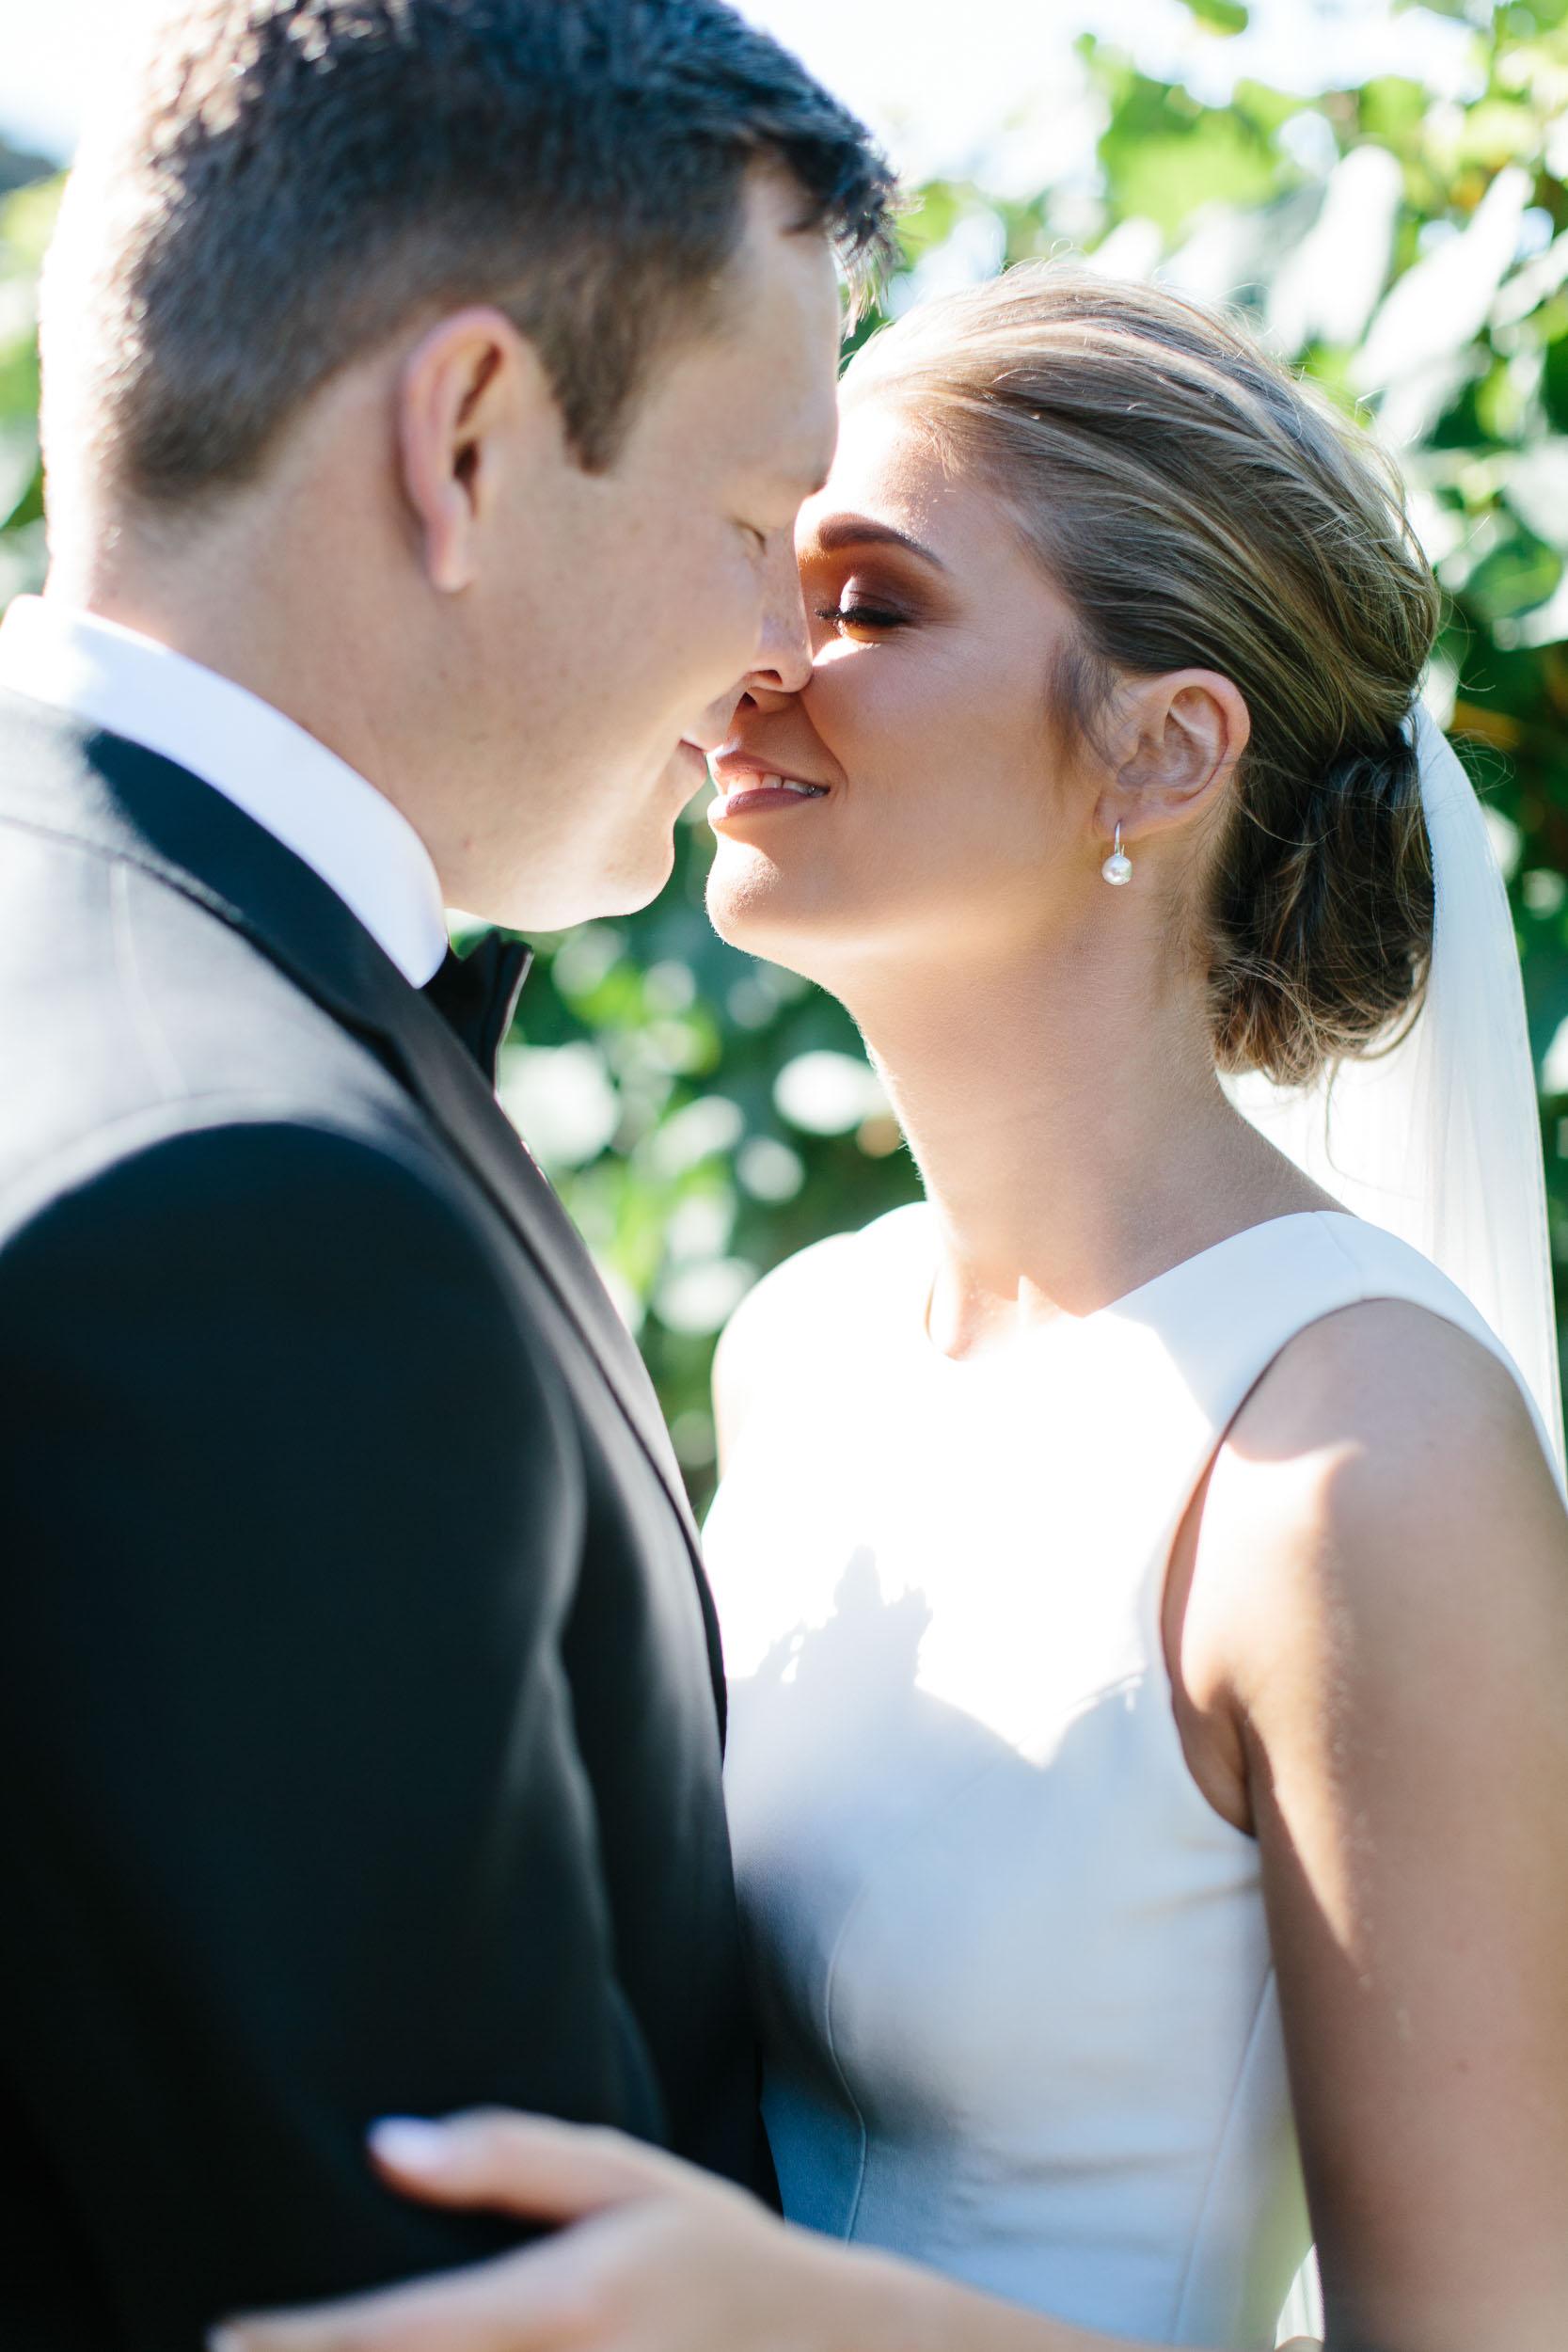 Kas-Richards-Mornington-Peninsula-Wedding-Lindenderry-Red-Hill-452.jpg